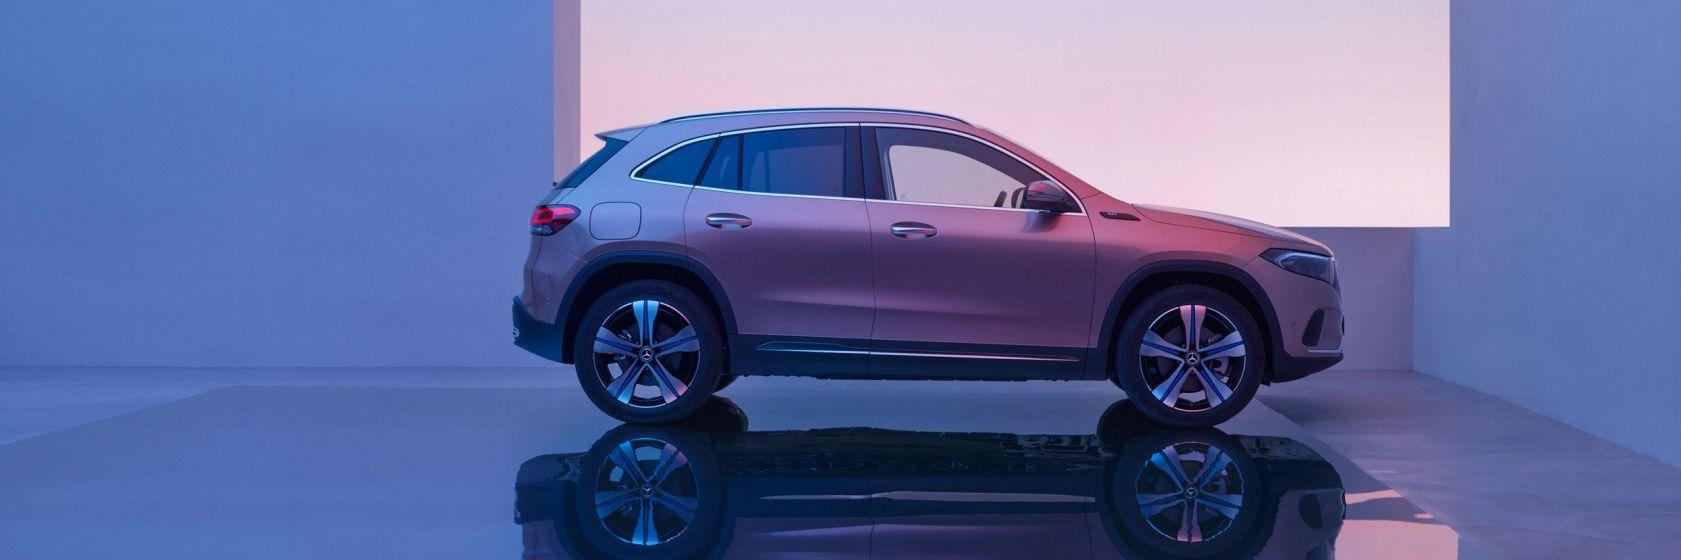 Ціна Mercedes-Benz EQA 2021